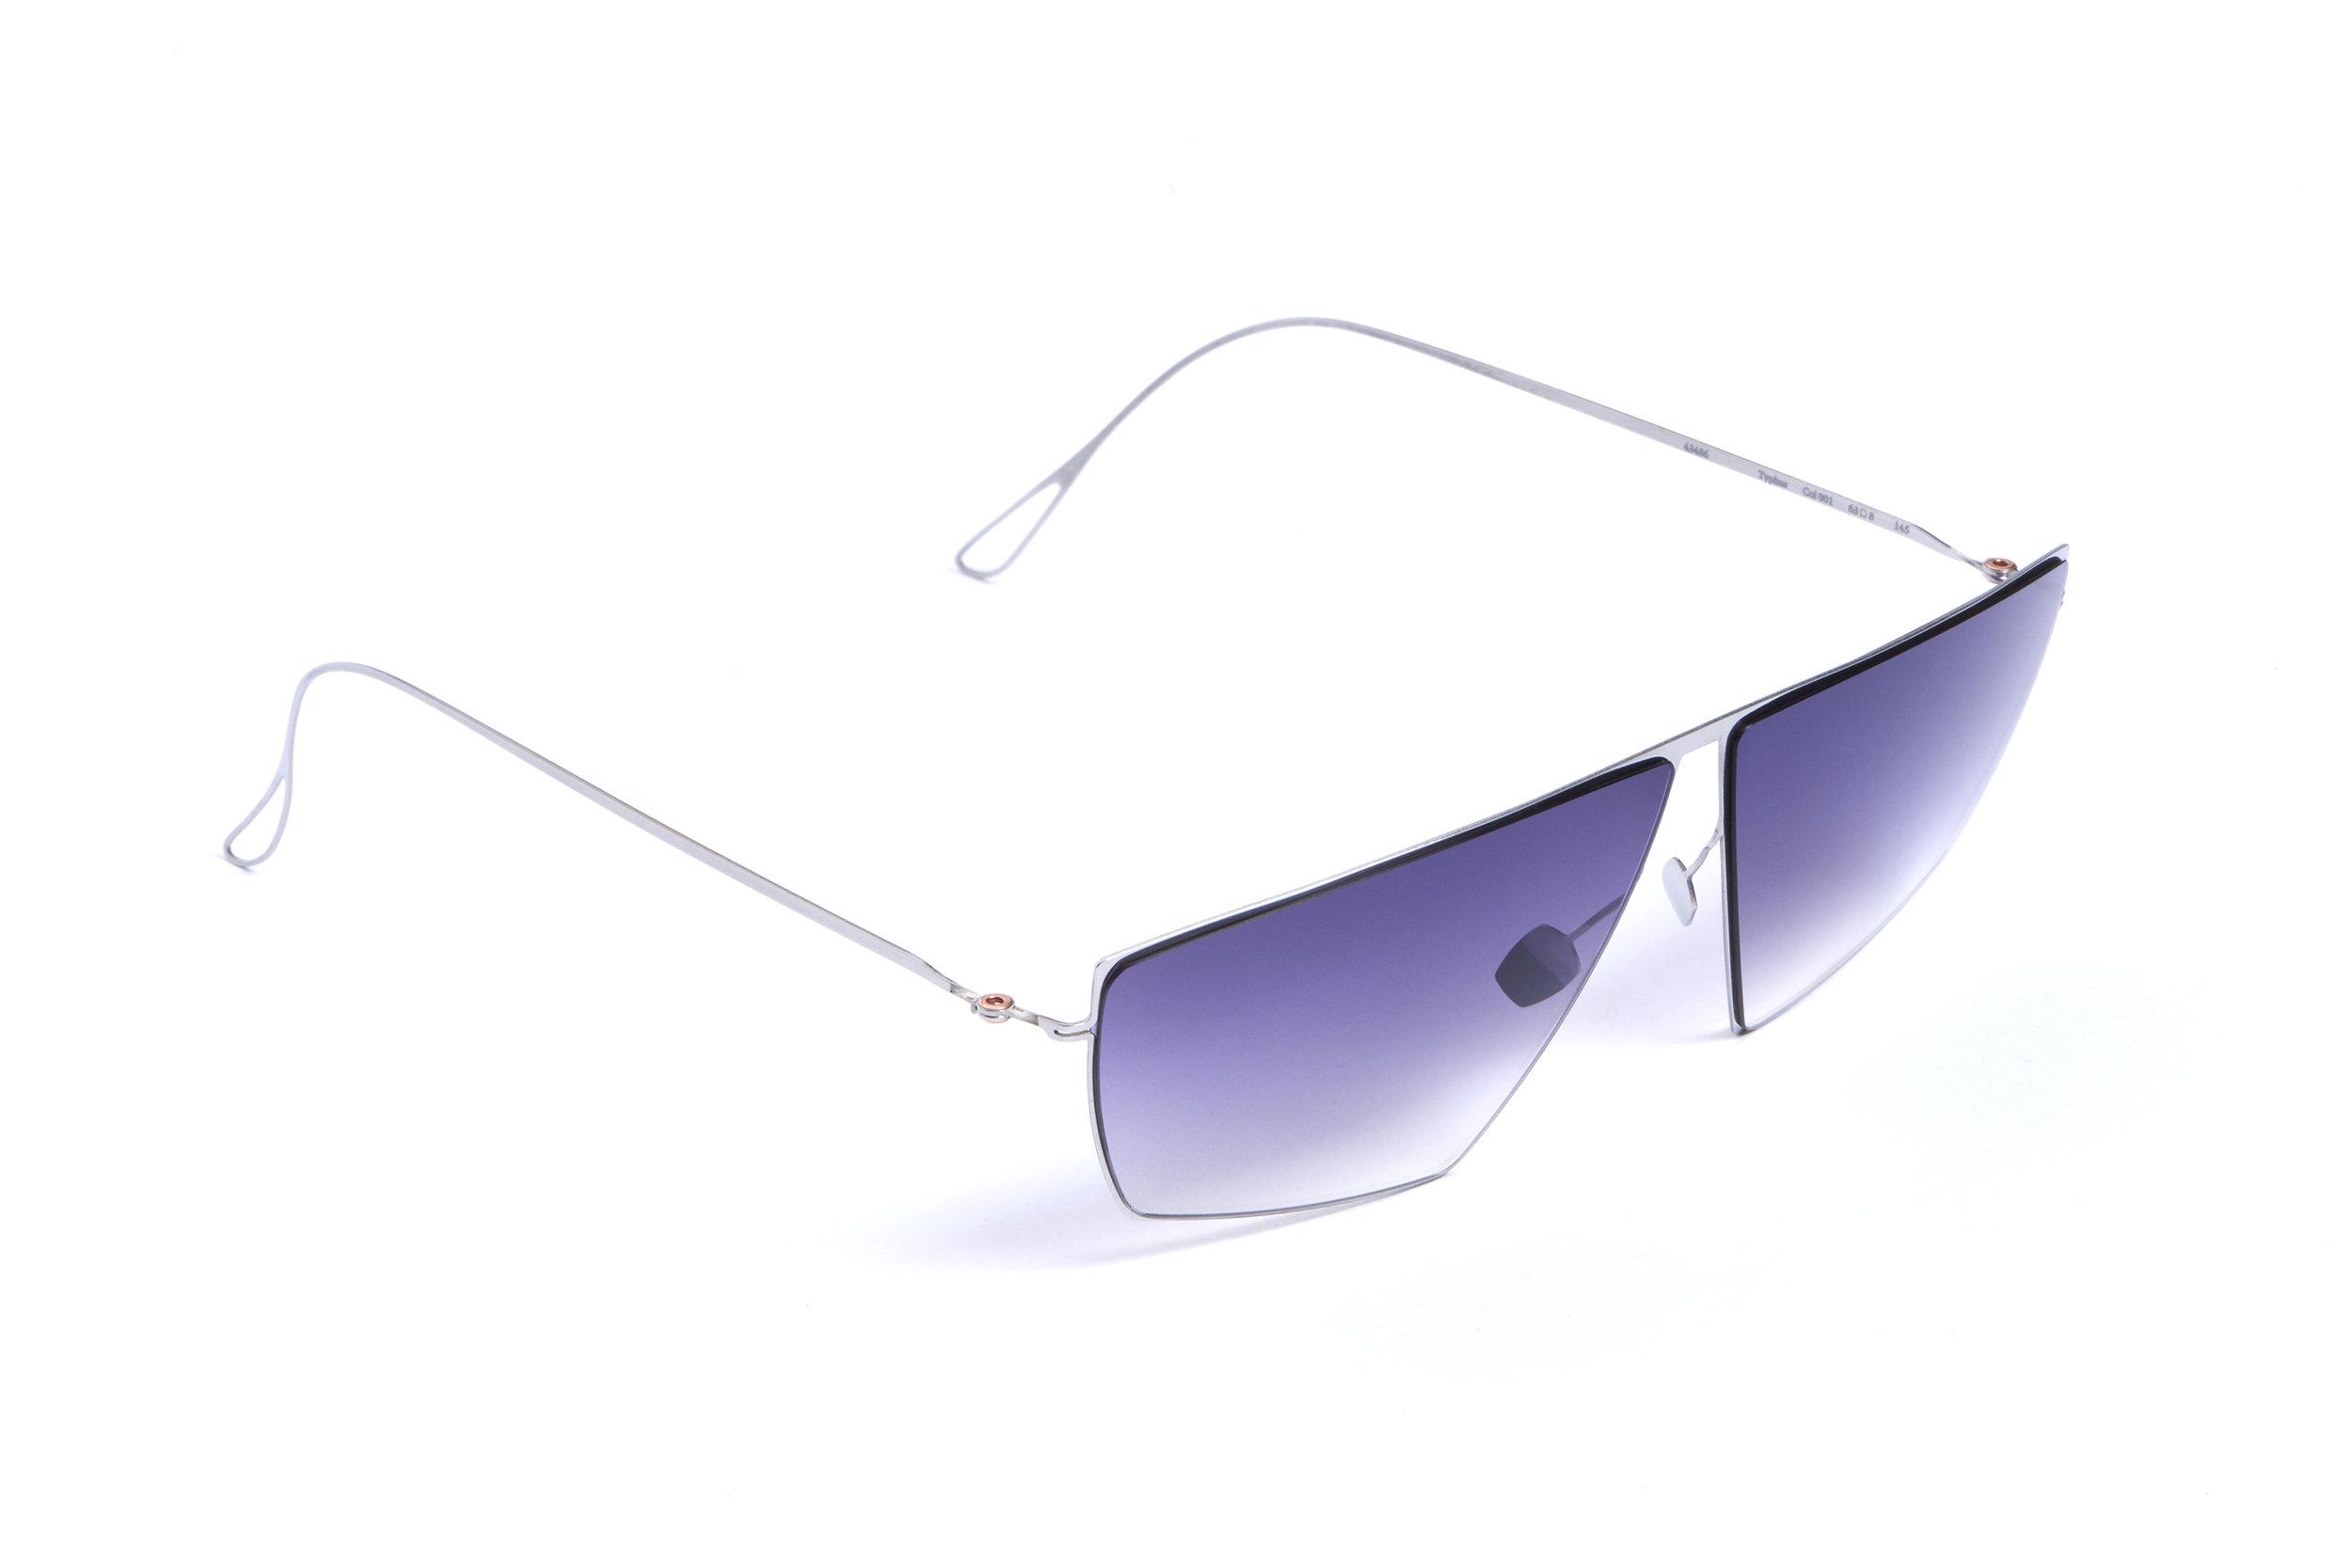 haffmans_neumeister_typhus_silver_purplerain_gradient_ultralight_sunglasses__angle_102438.jpg